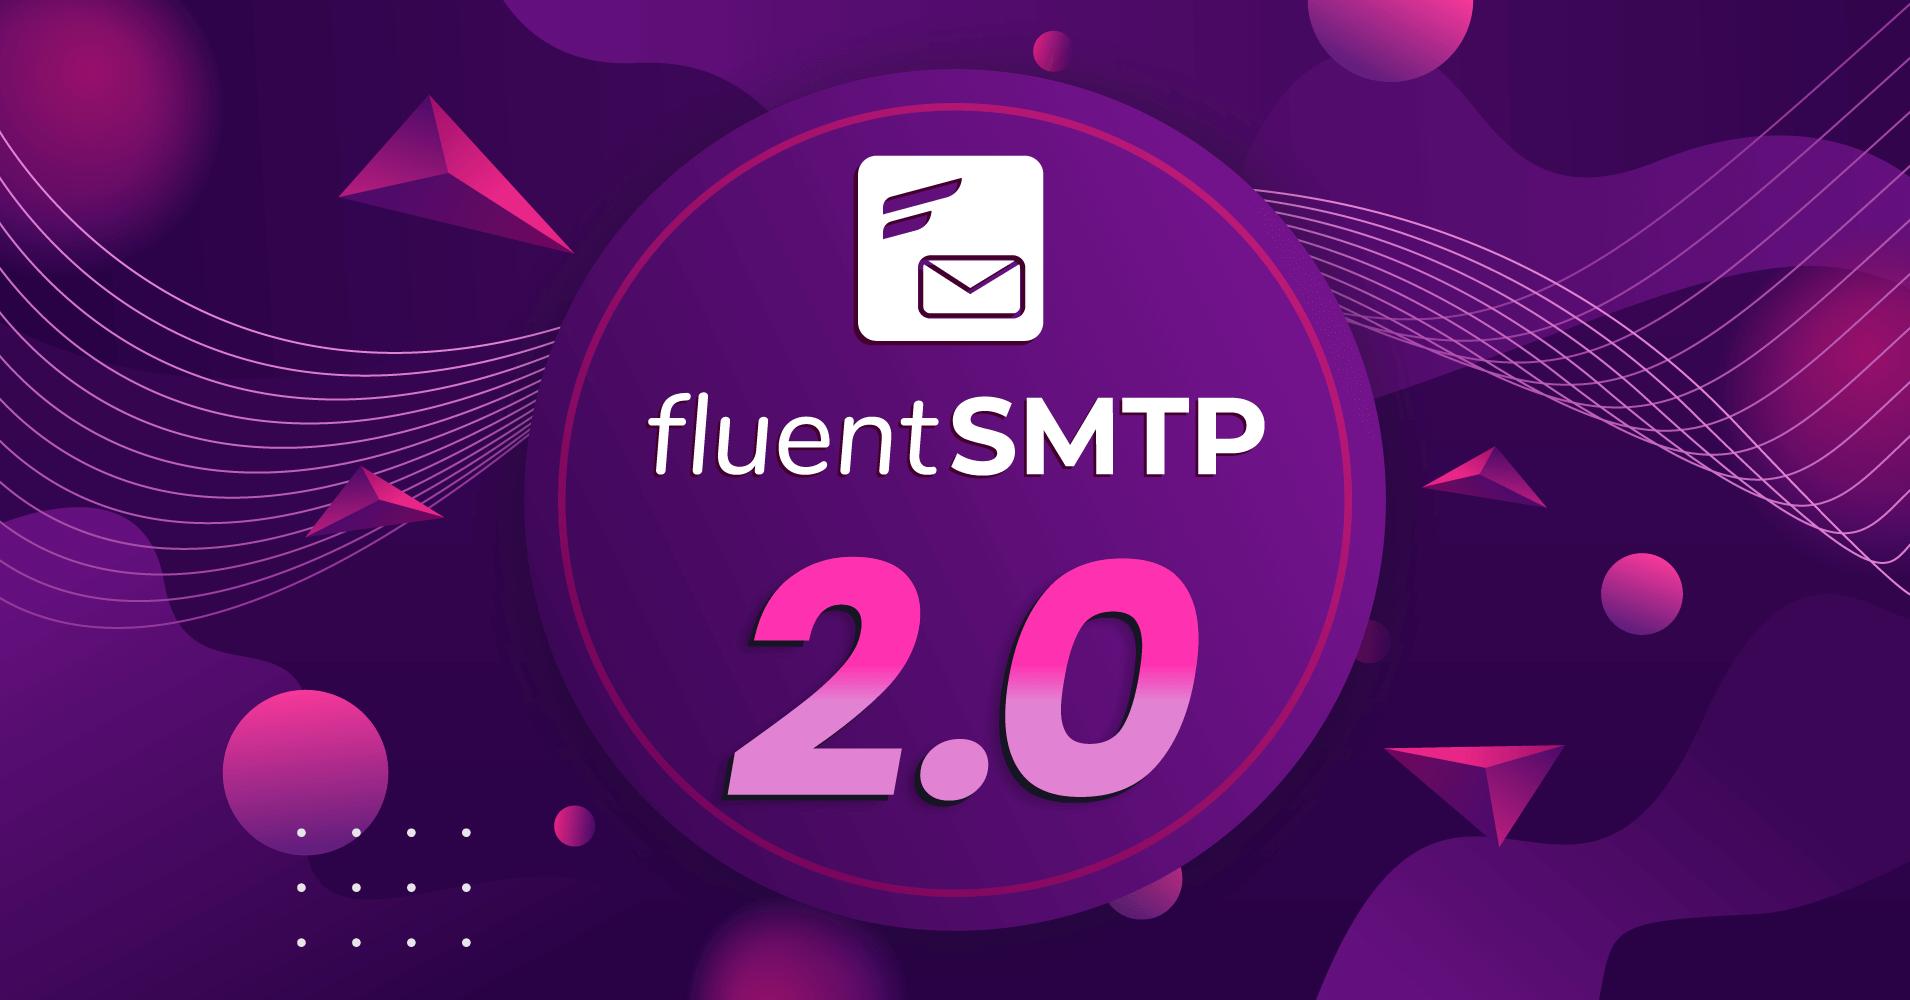 fluentsmtp 2.0